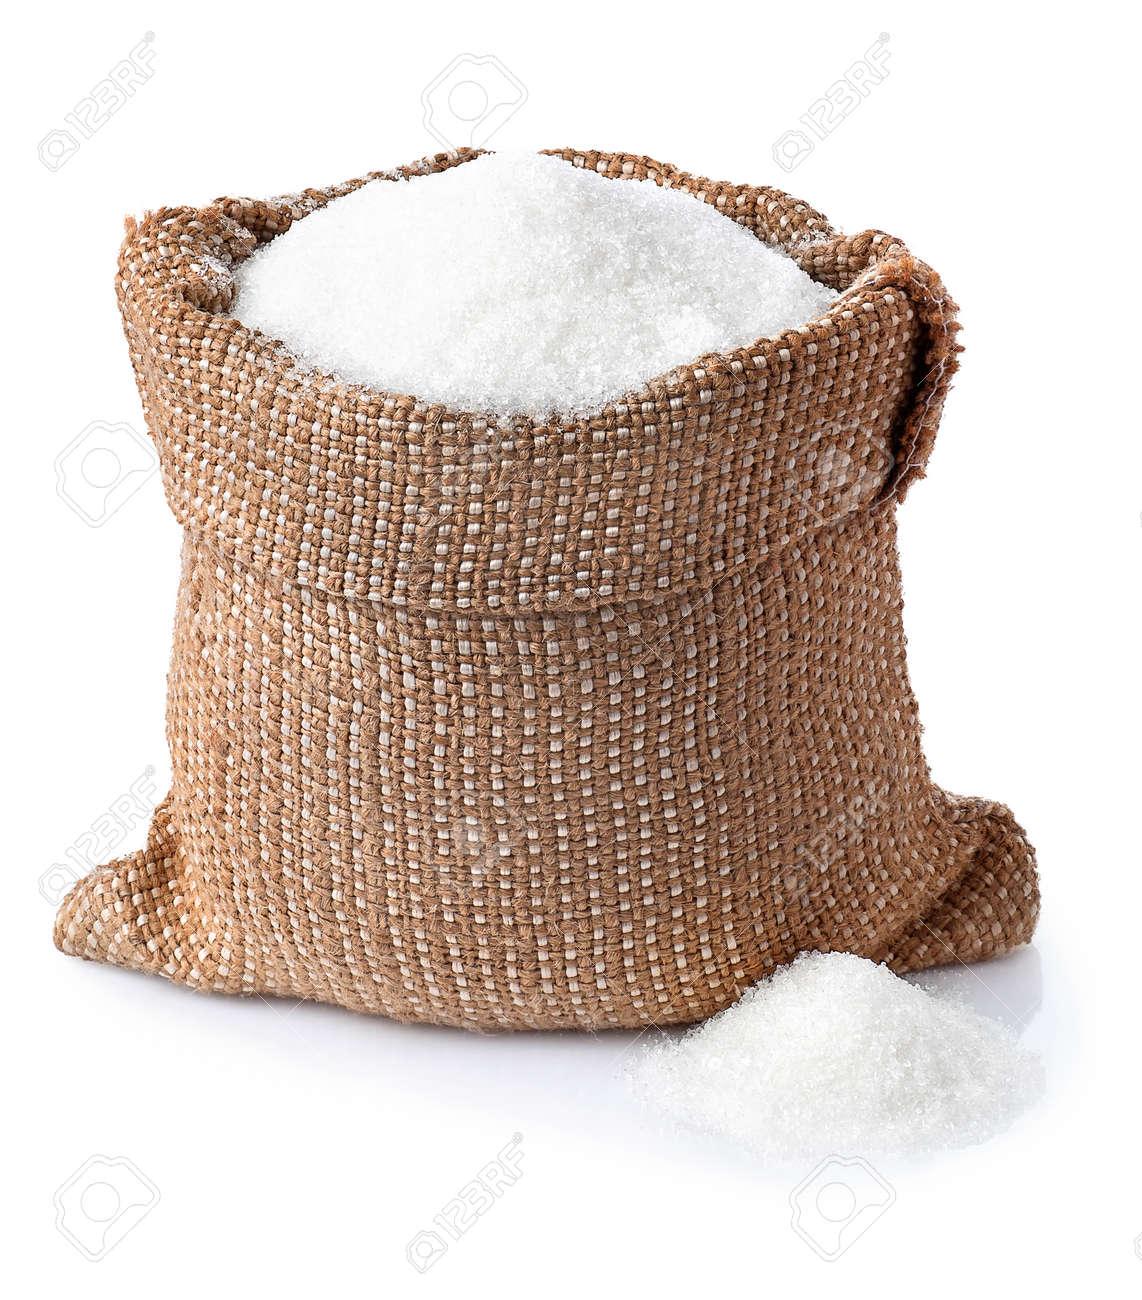 Sugar. Sugar in burlap sack isolated on white background. Full bag of sugar crystals closeup - 60398346